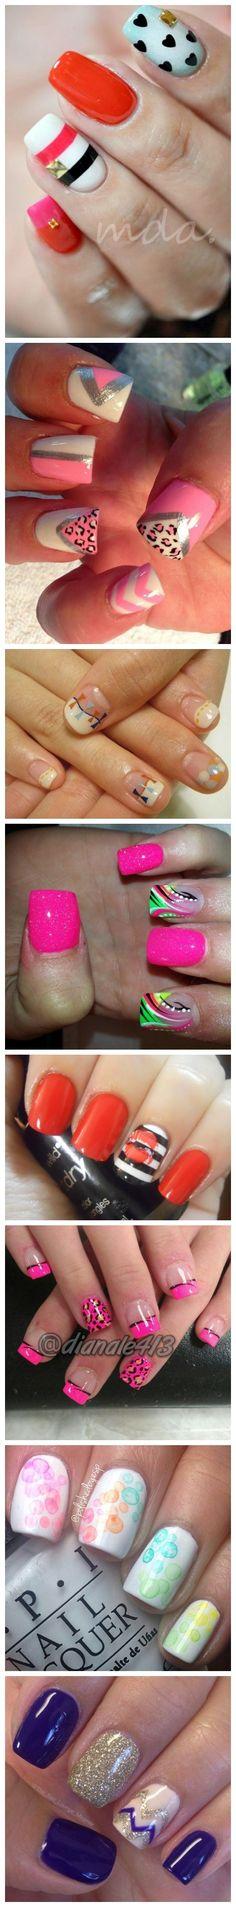 Nail Design Samples